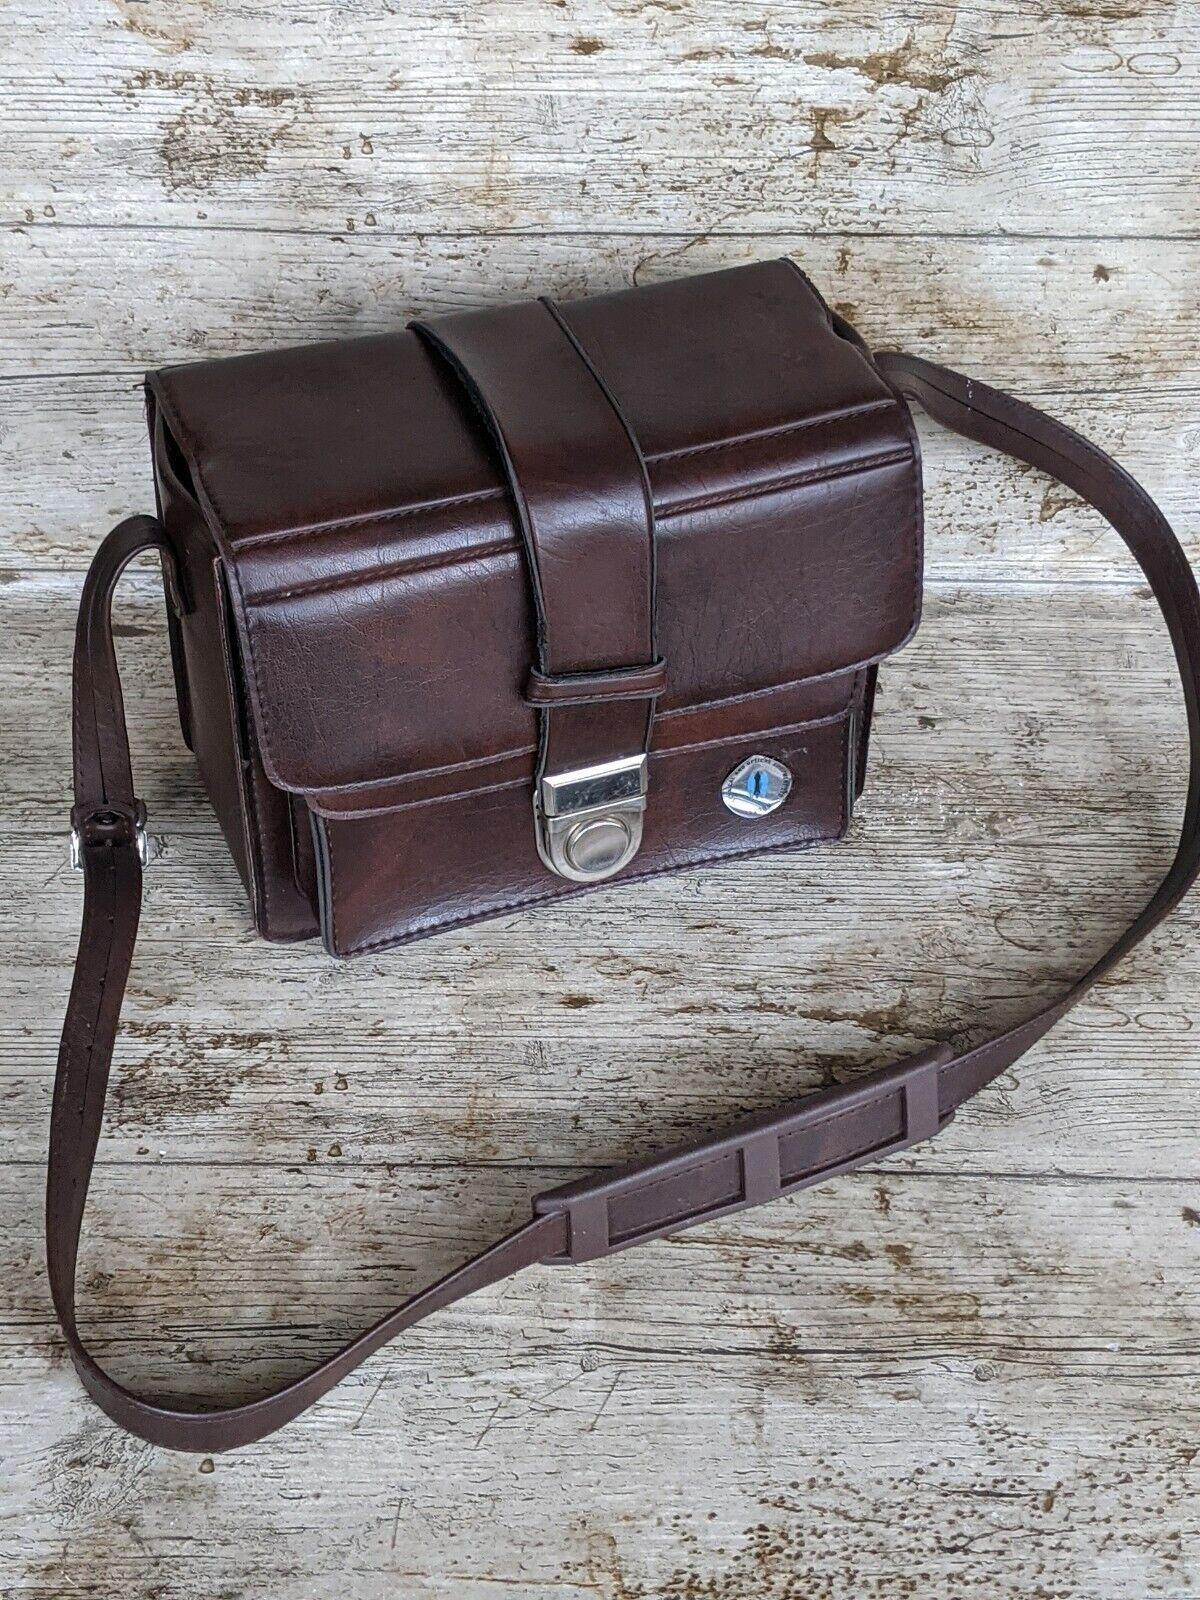 Vintage Brown Hard Shell Camera & Lenses Protective Bag Carry Case